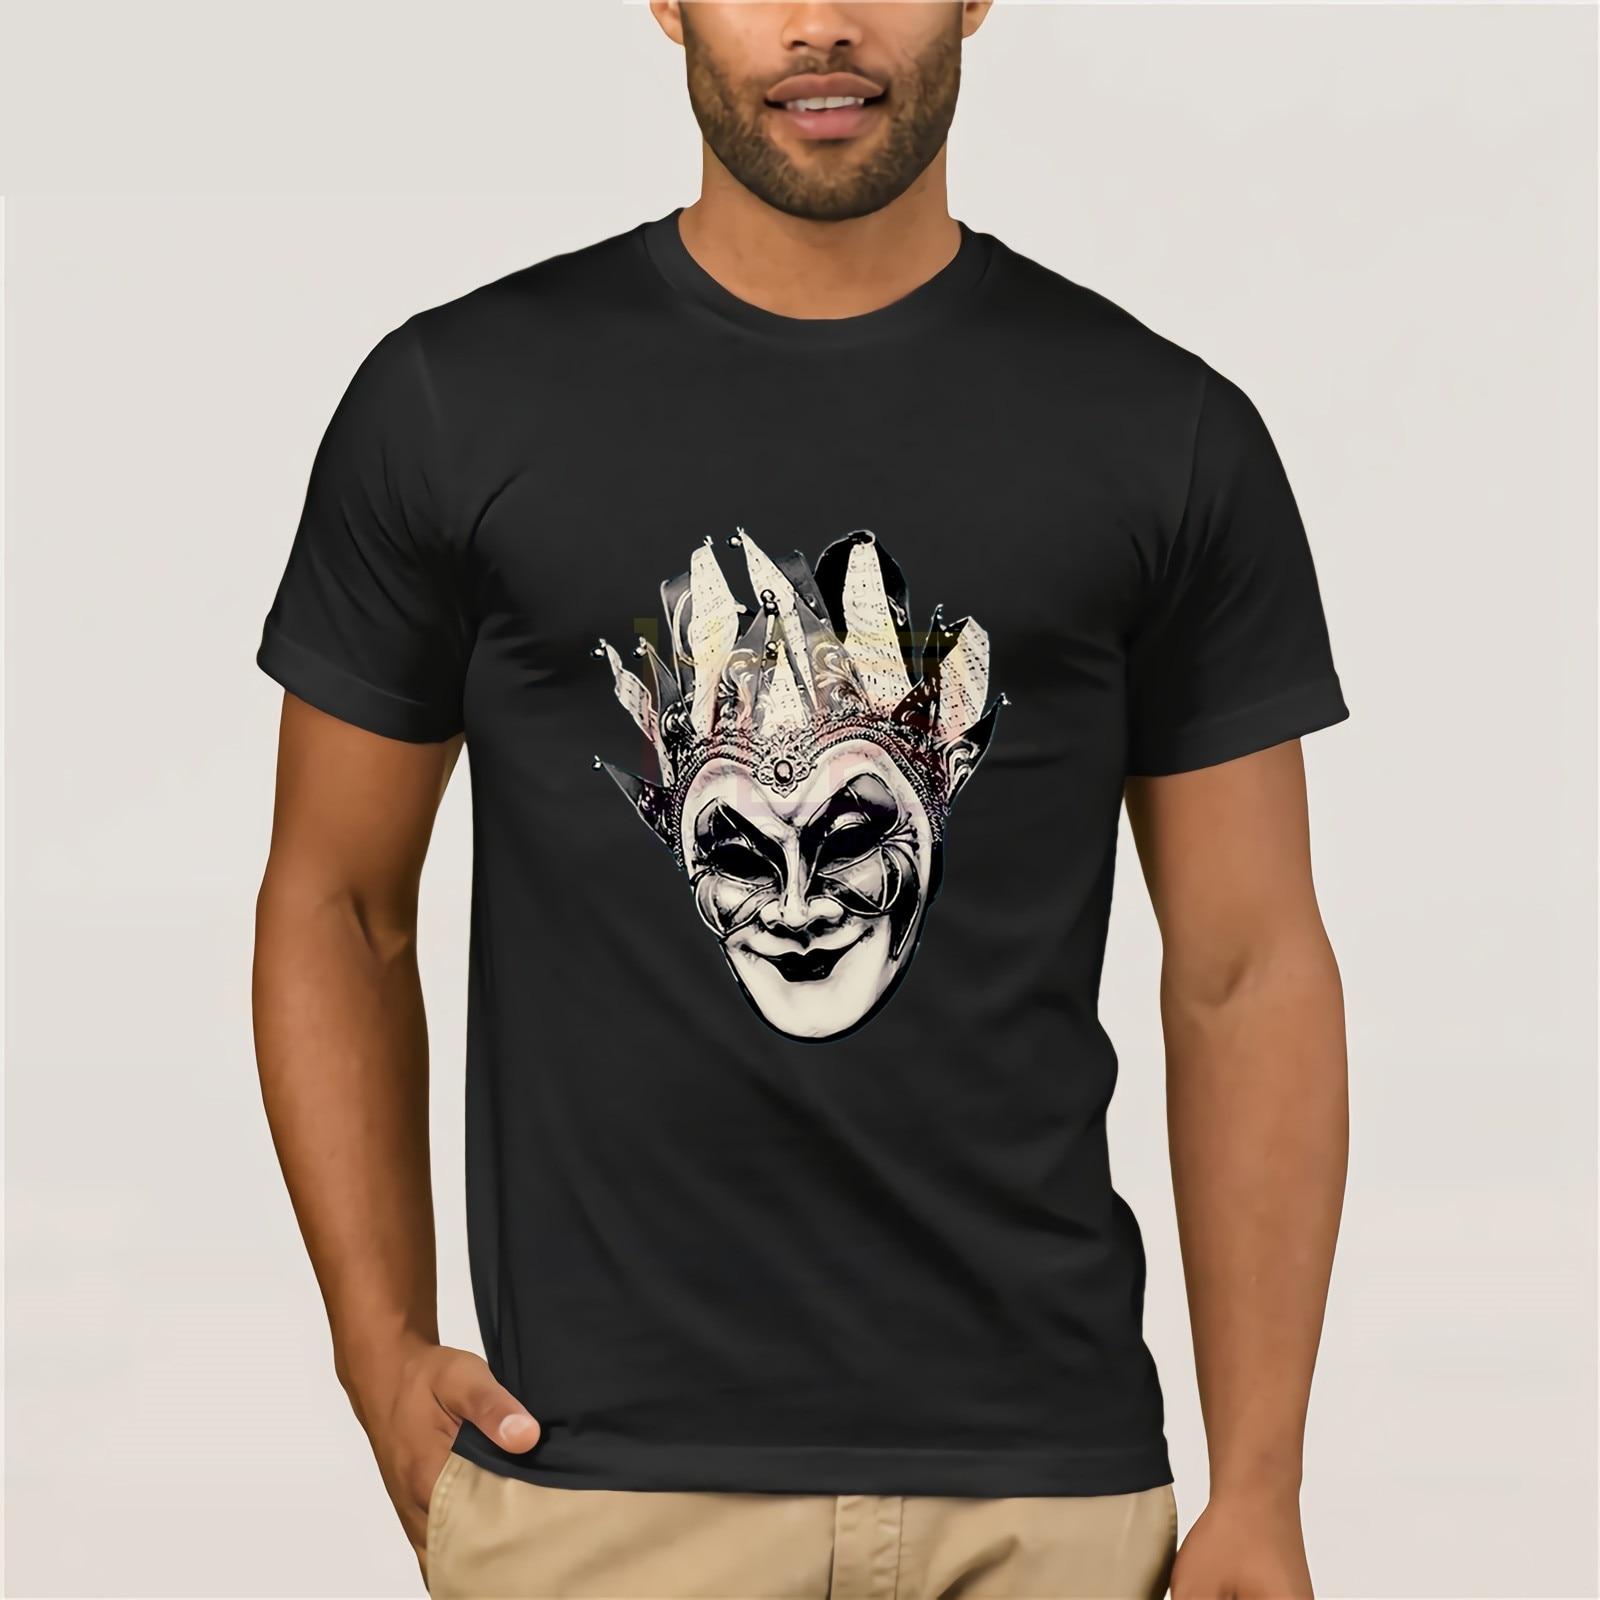 DJ BORIS BREJCHA T-SHIRT High-Tech Minimal Techno Music Unisex men Cartoon New Fashion top tees t-shirt